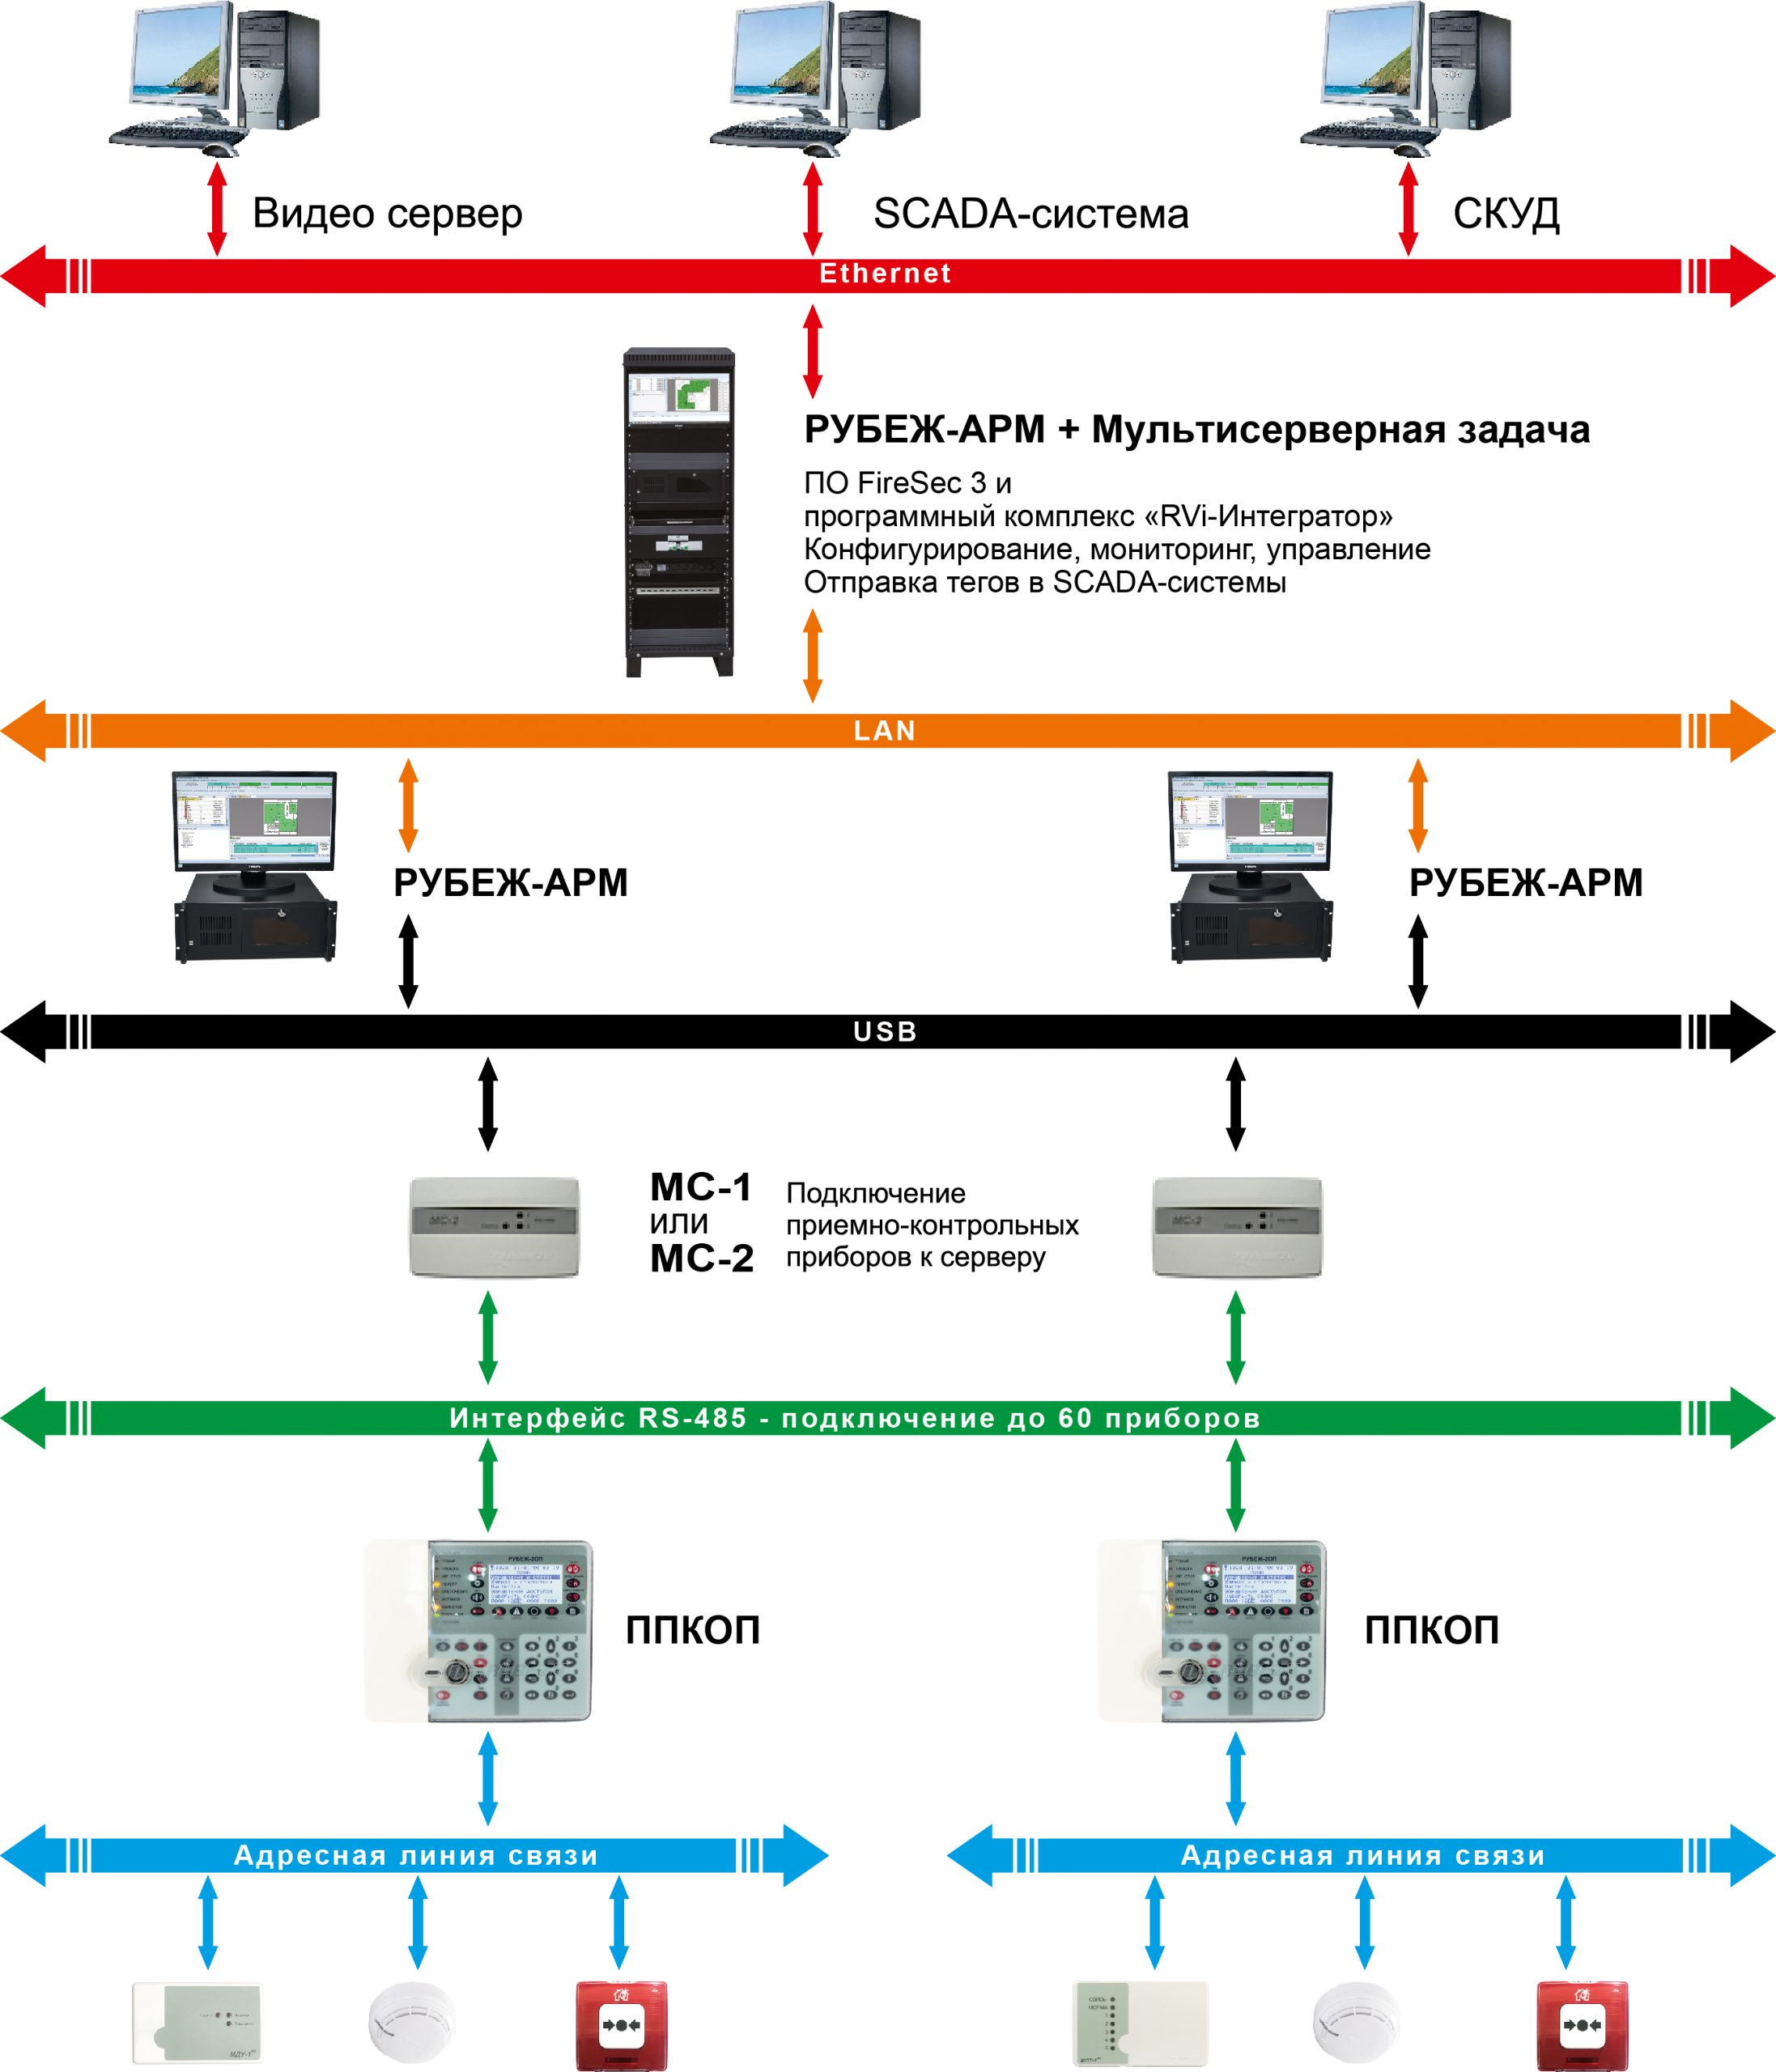 ЦПИУ РУБЕЖ-АРМ ИСП. 4 (НАСТОЛЬНЫЙ) ПРОТ. R3